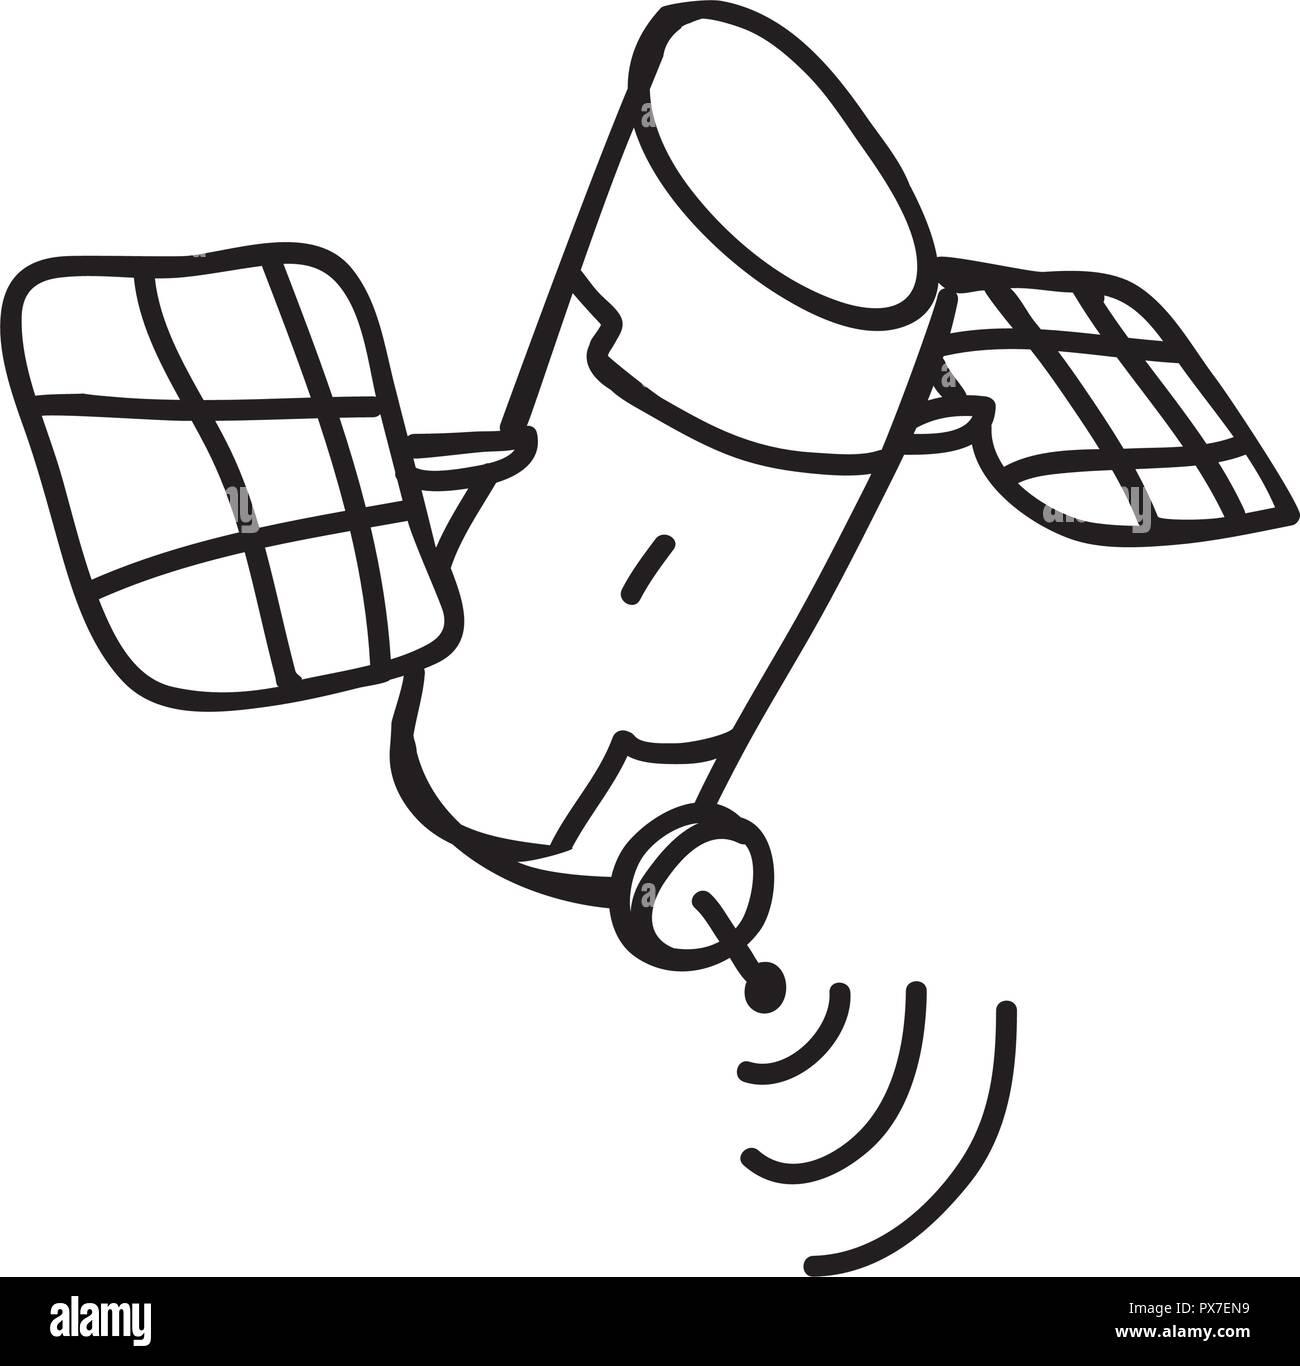 artificial satellite orbiting icon vector illustration design - Stock Image